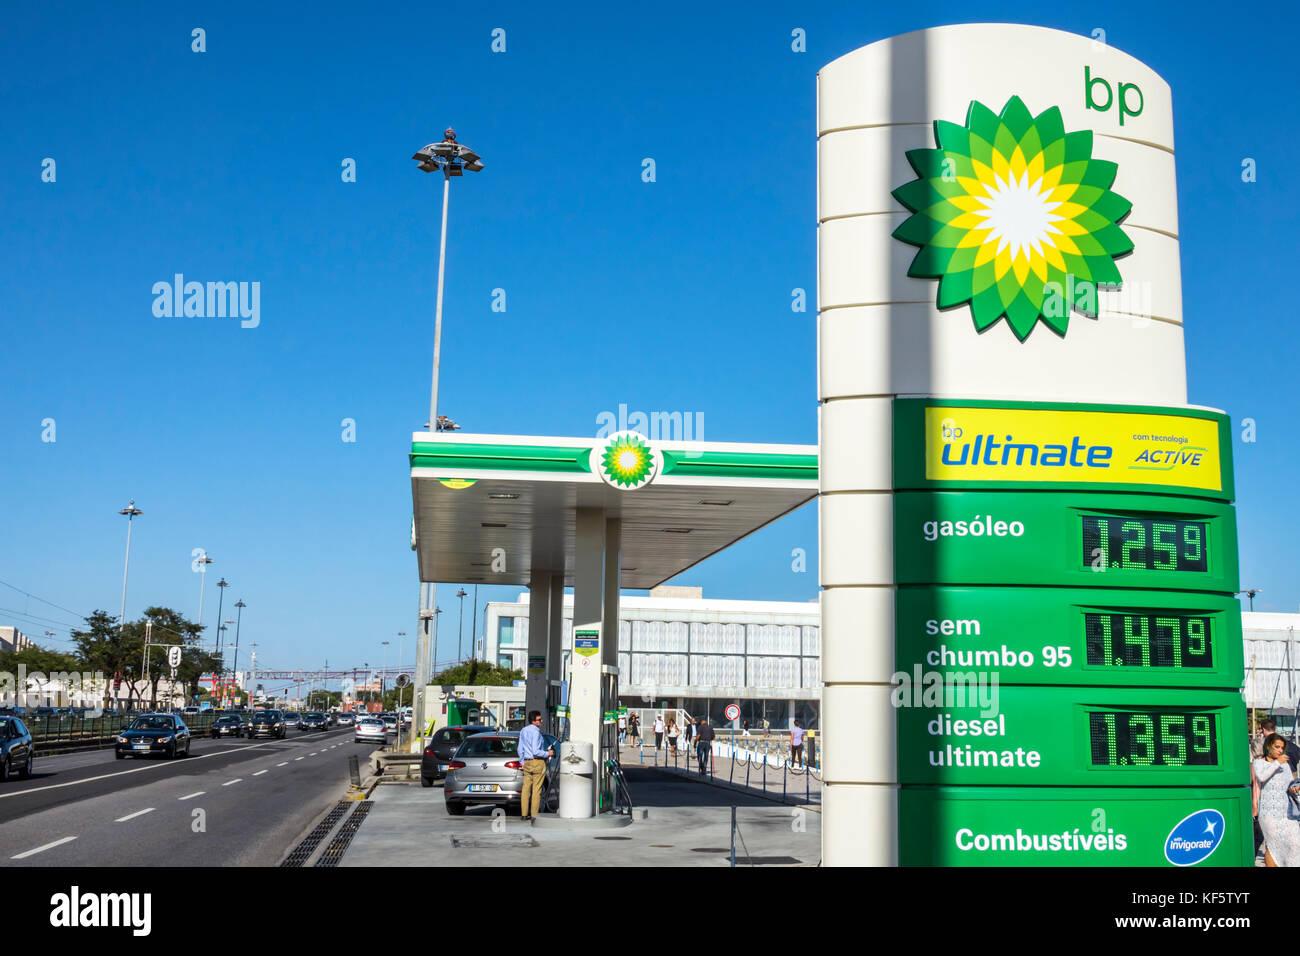 Lisbon Portugal Belem Avenida Brasilia parkway bp British Petroleum gas station pump price - Stock Image